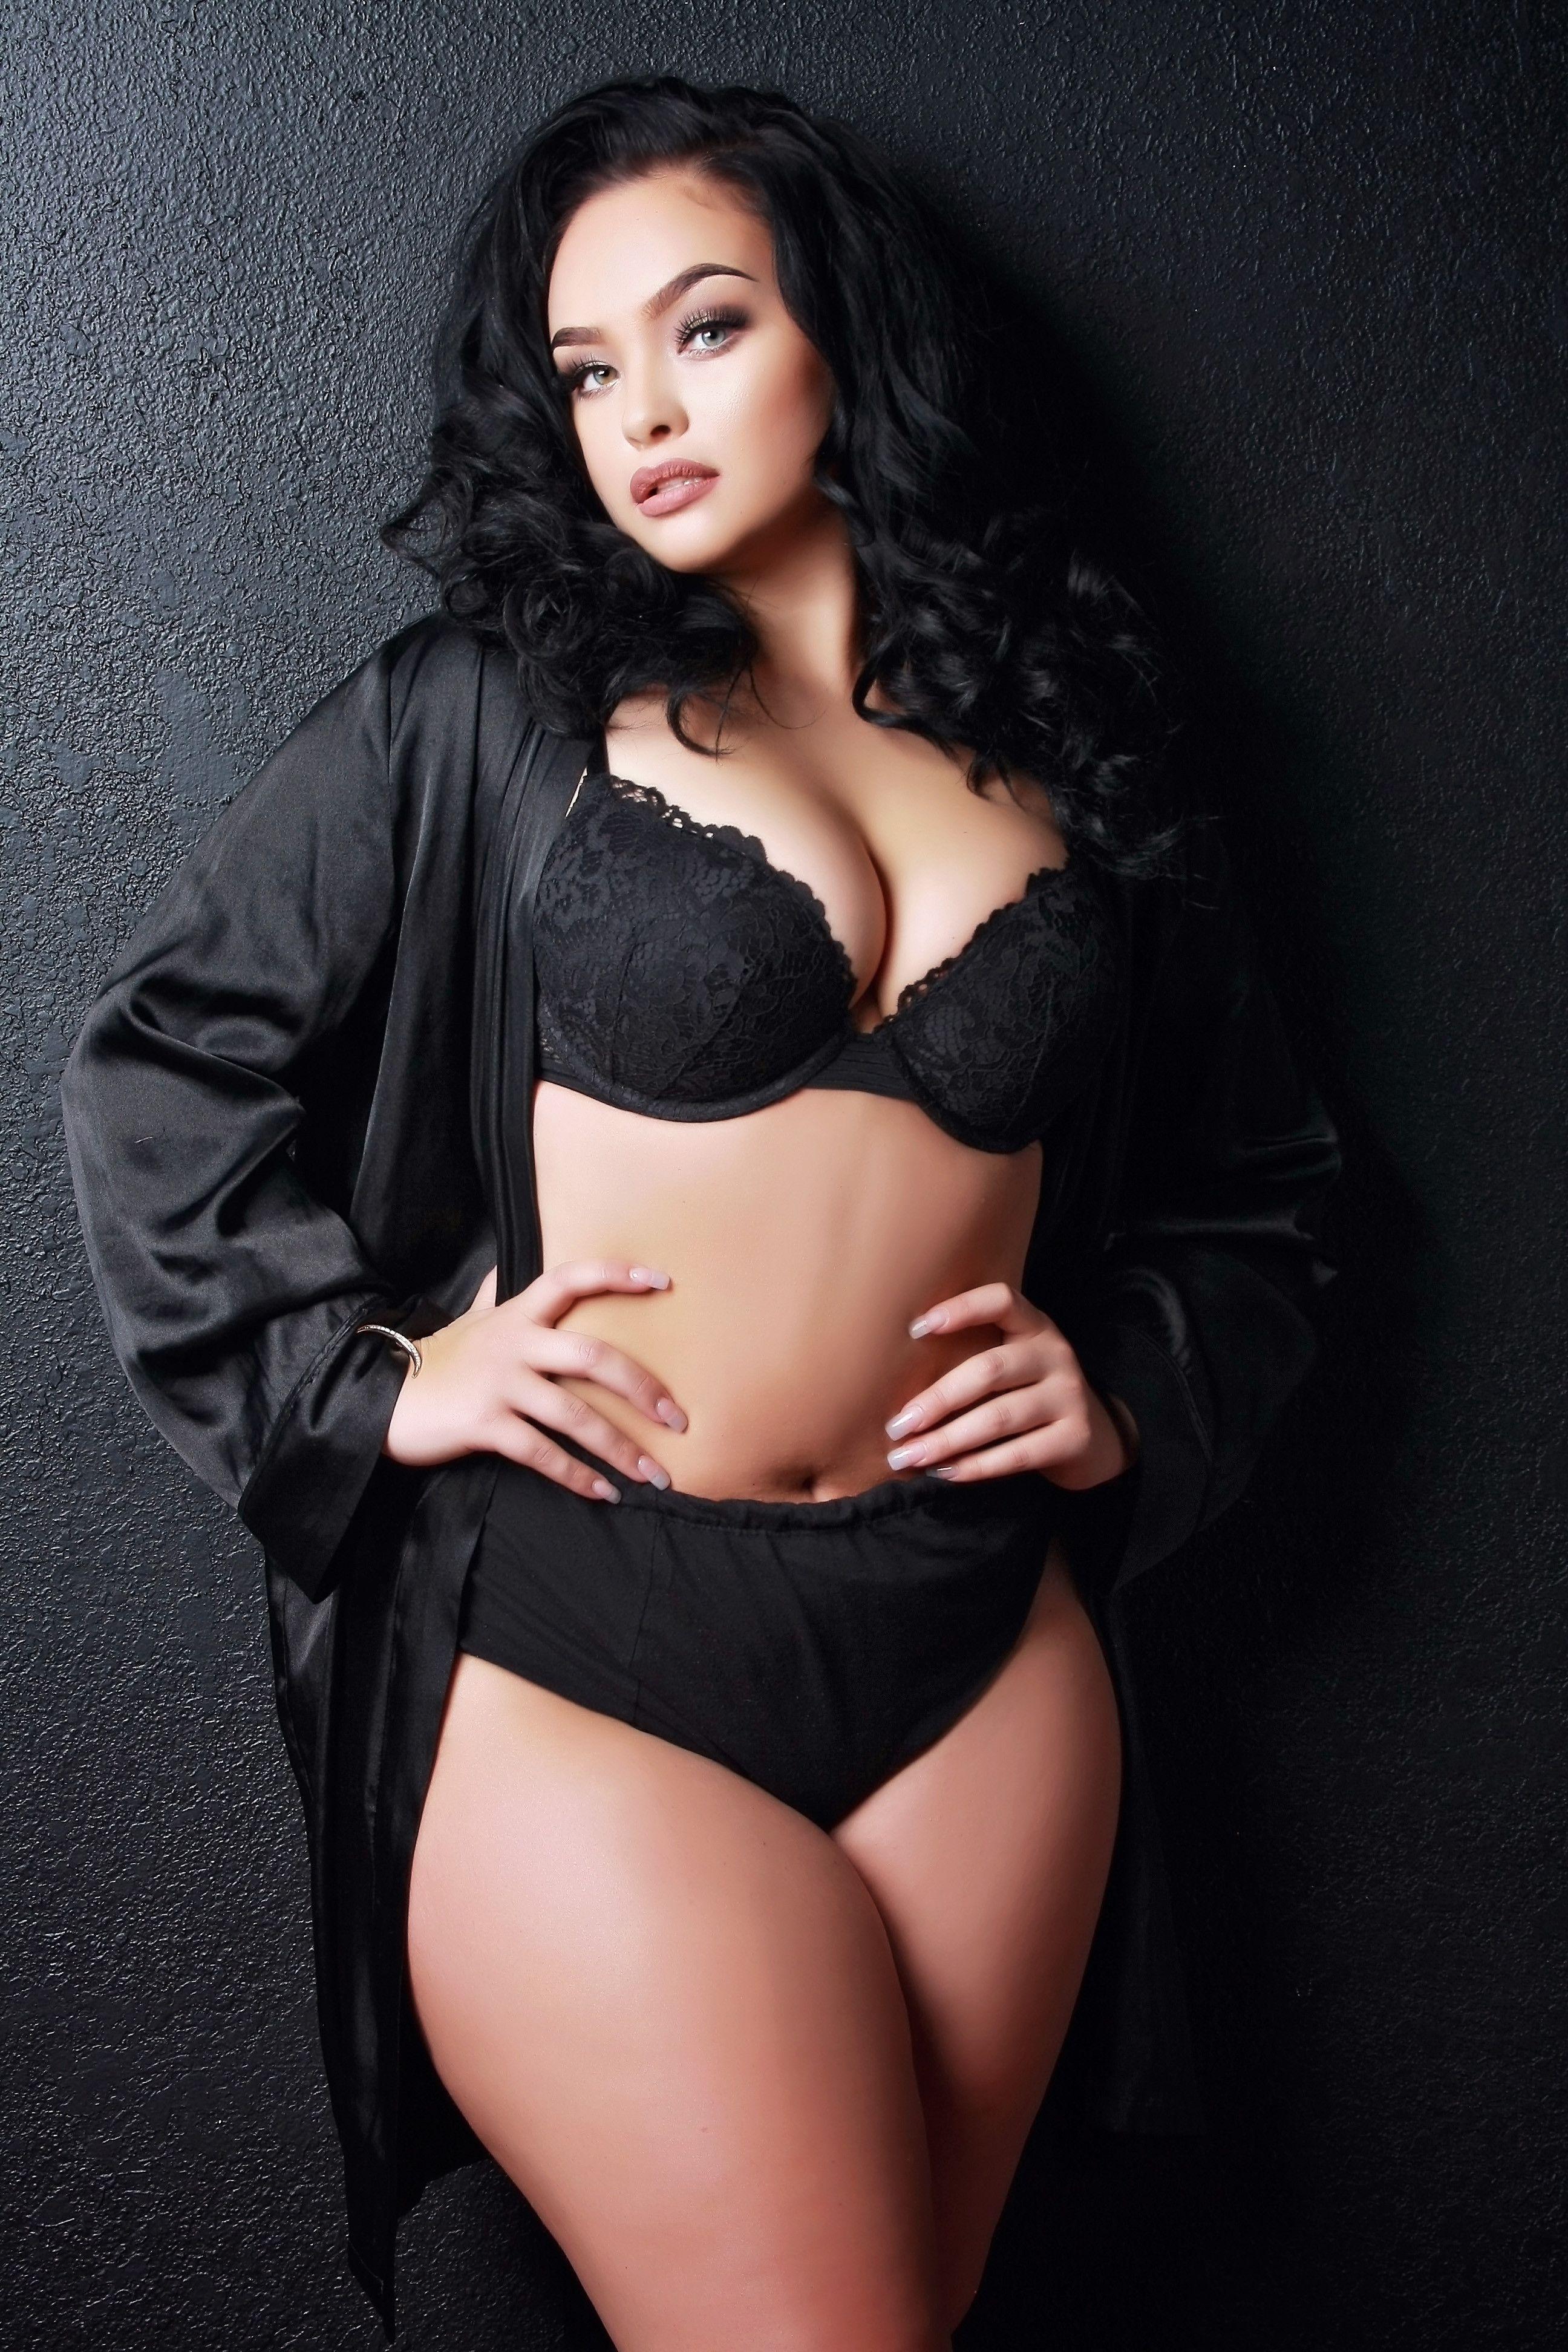 6d526c8f3e  boudoir  curves  boudoirphotographer  texasboudoir  blackonblack   beautyandboudie  4forty4